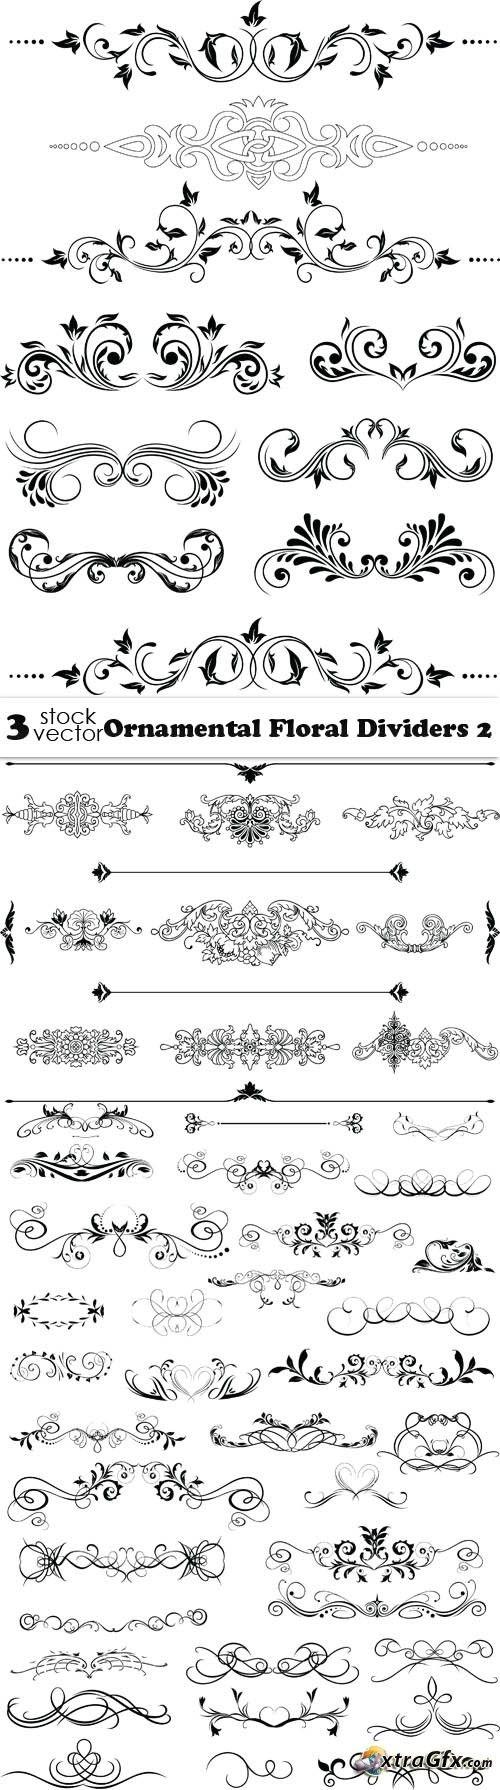 Vectors ornamental floral dividers calligraphy pinterest